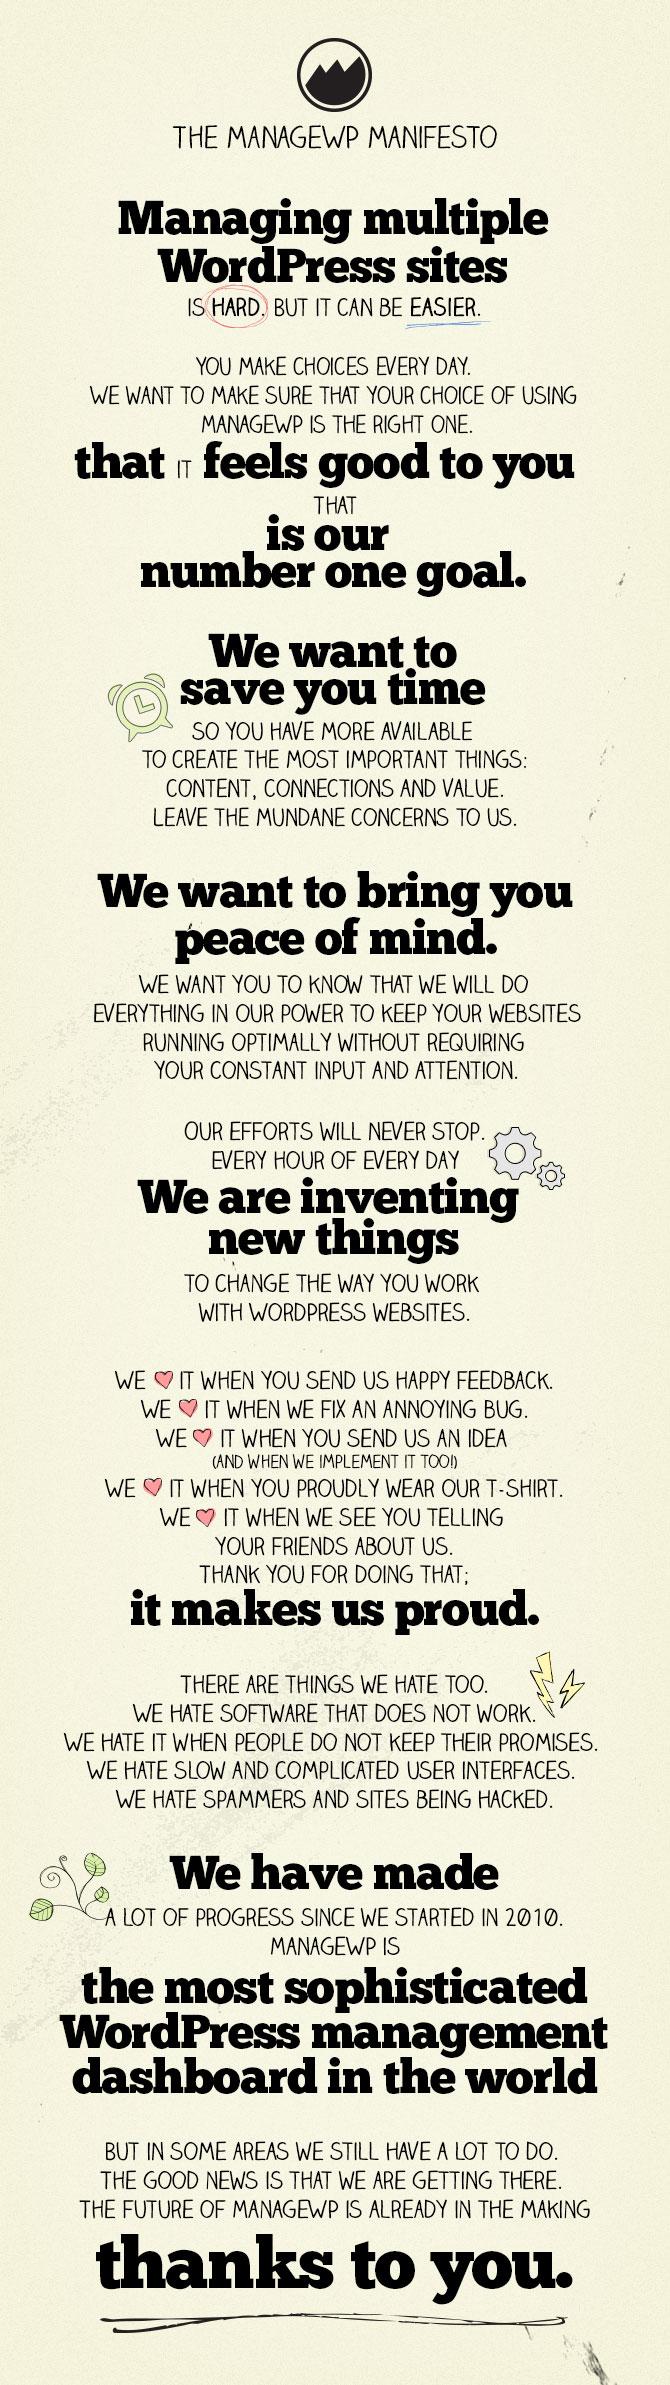 ManageWP Manifesto